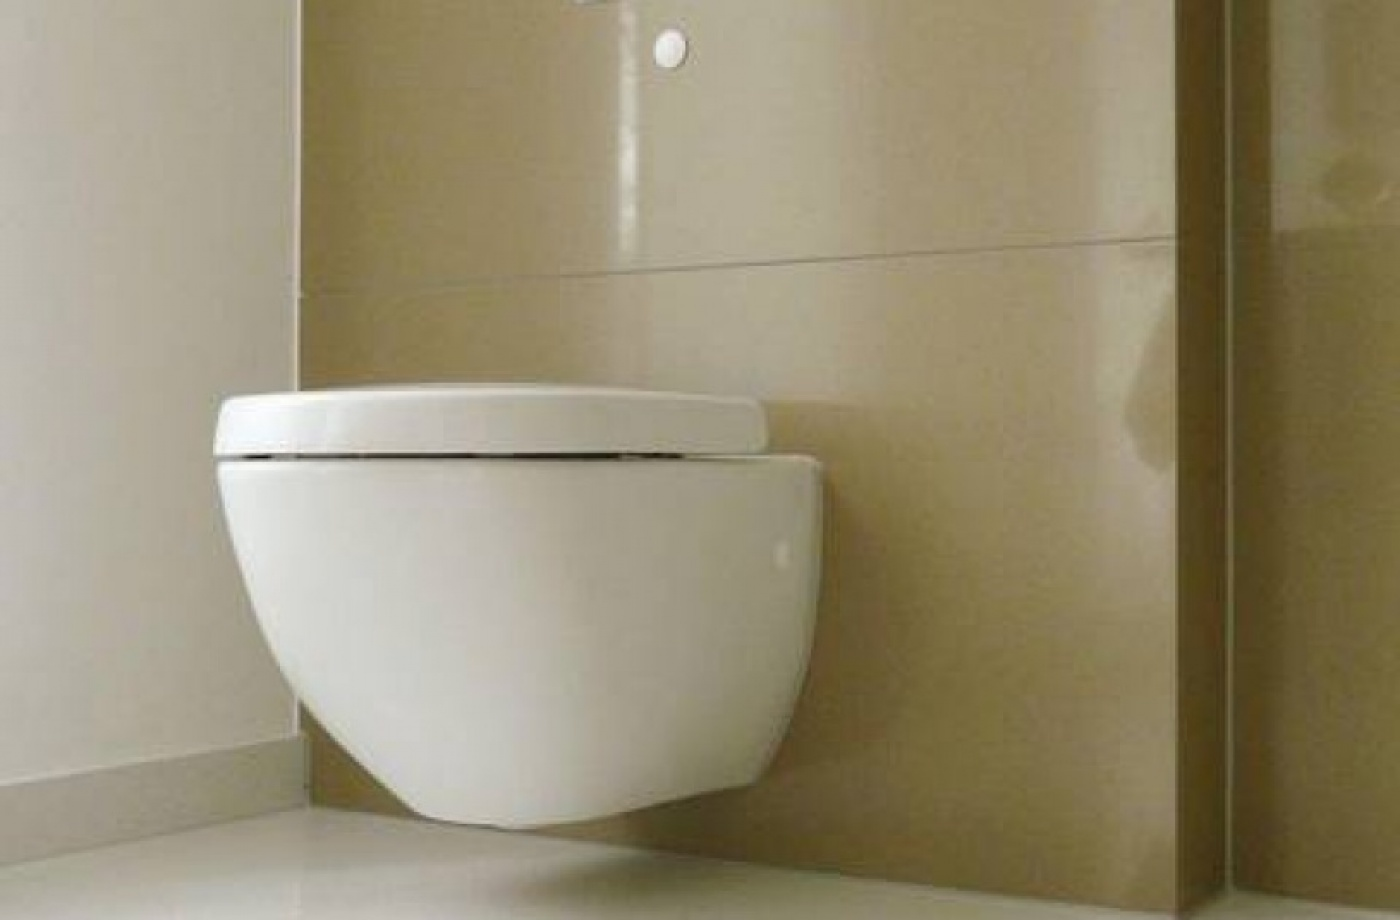 Ardun Habillage toilettes en Quartz Maron Canela. Wc design Stark